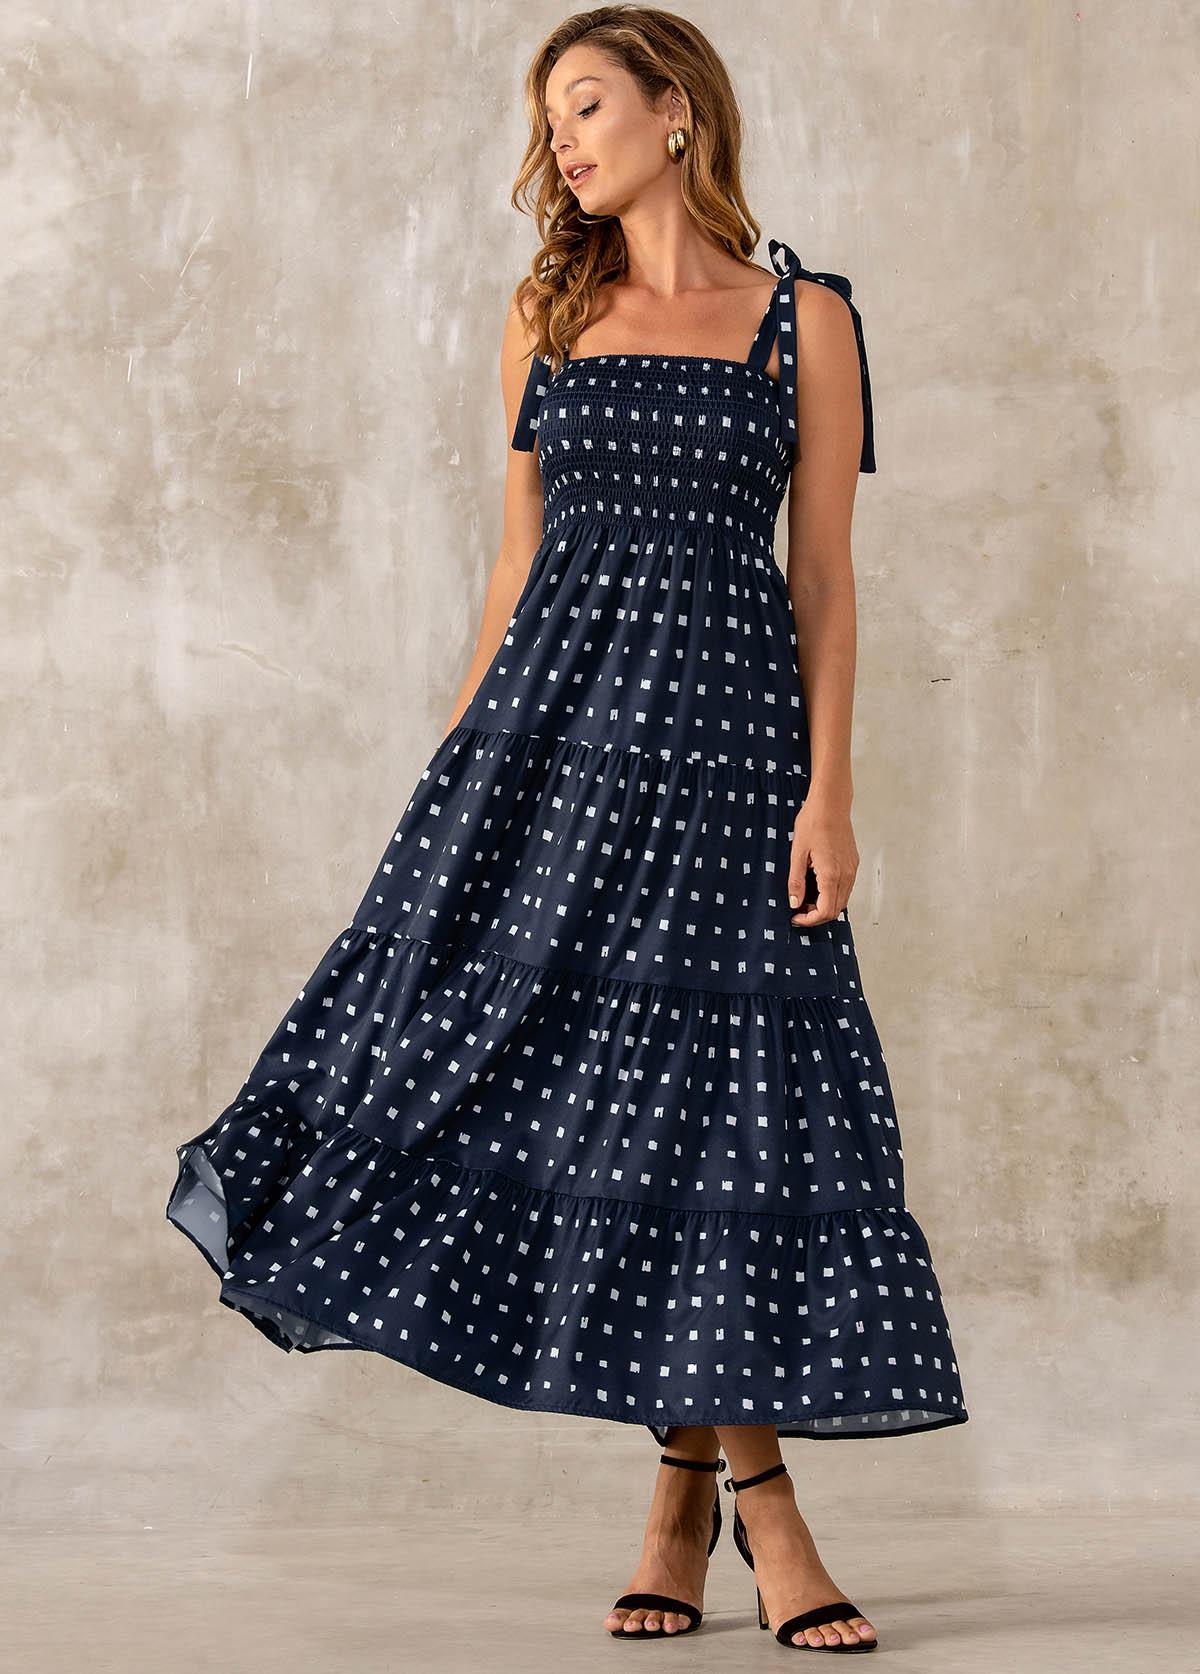 Smocked Tie Strap Geometric Print Dress